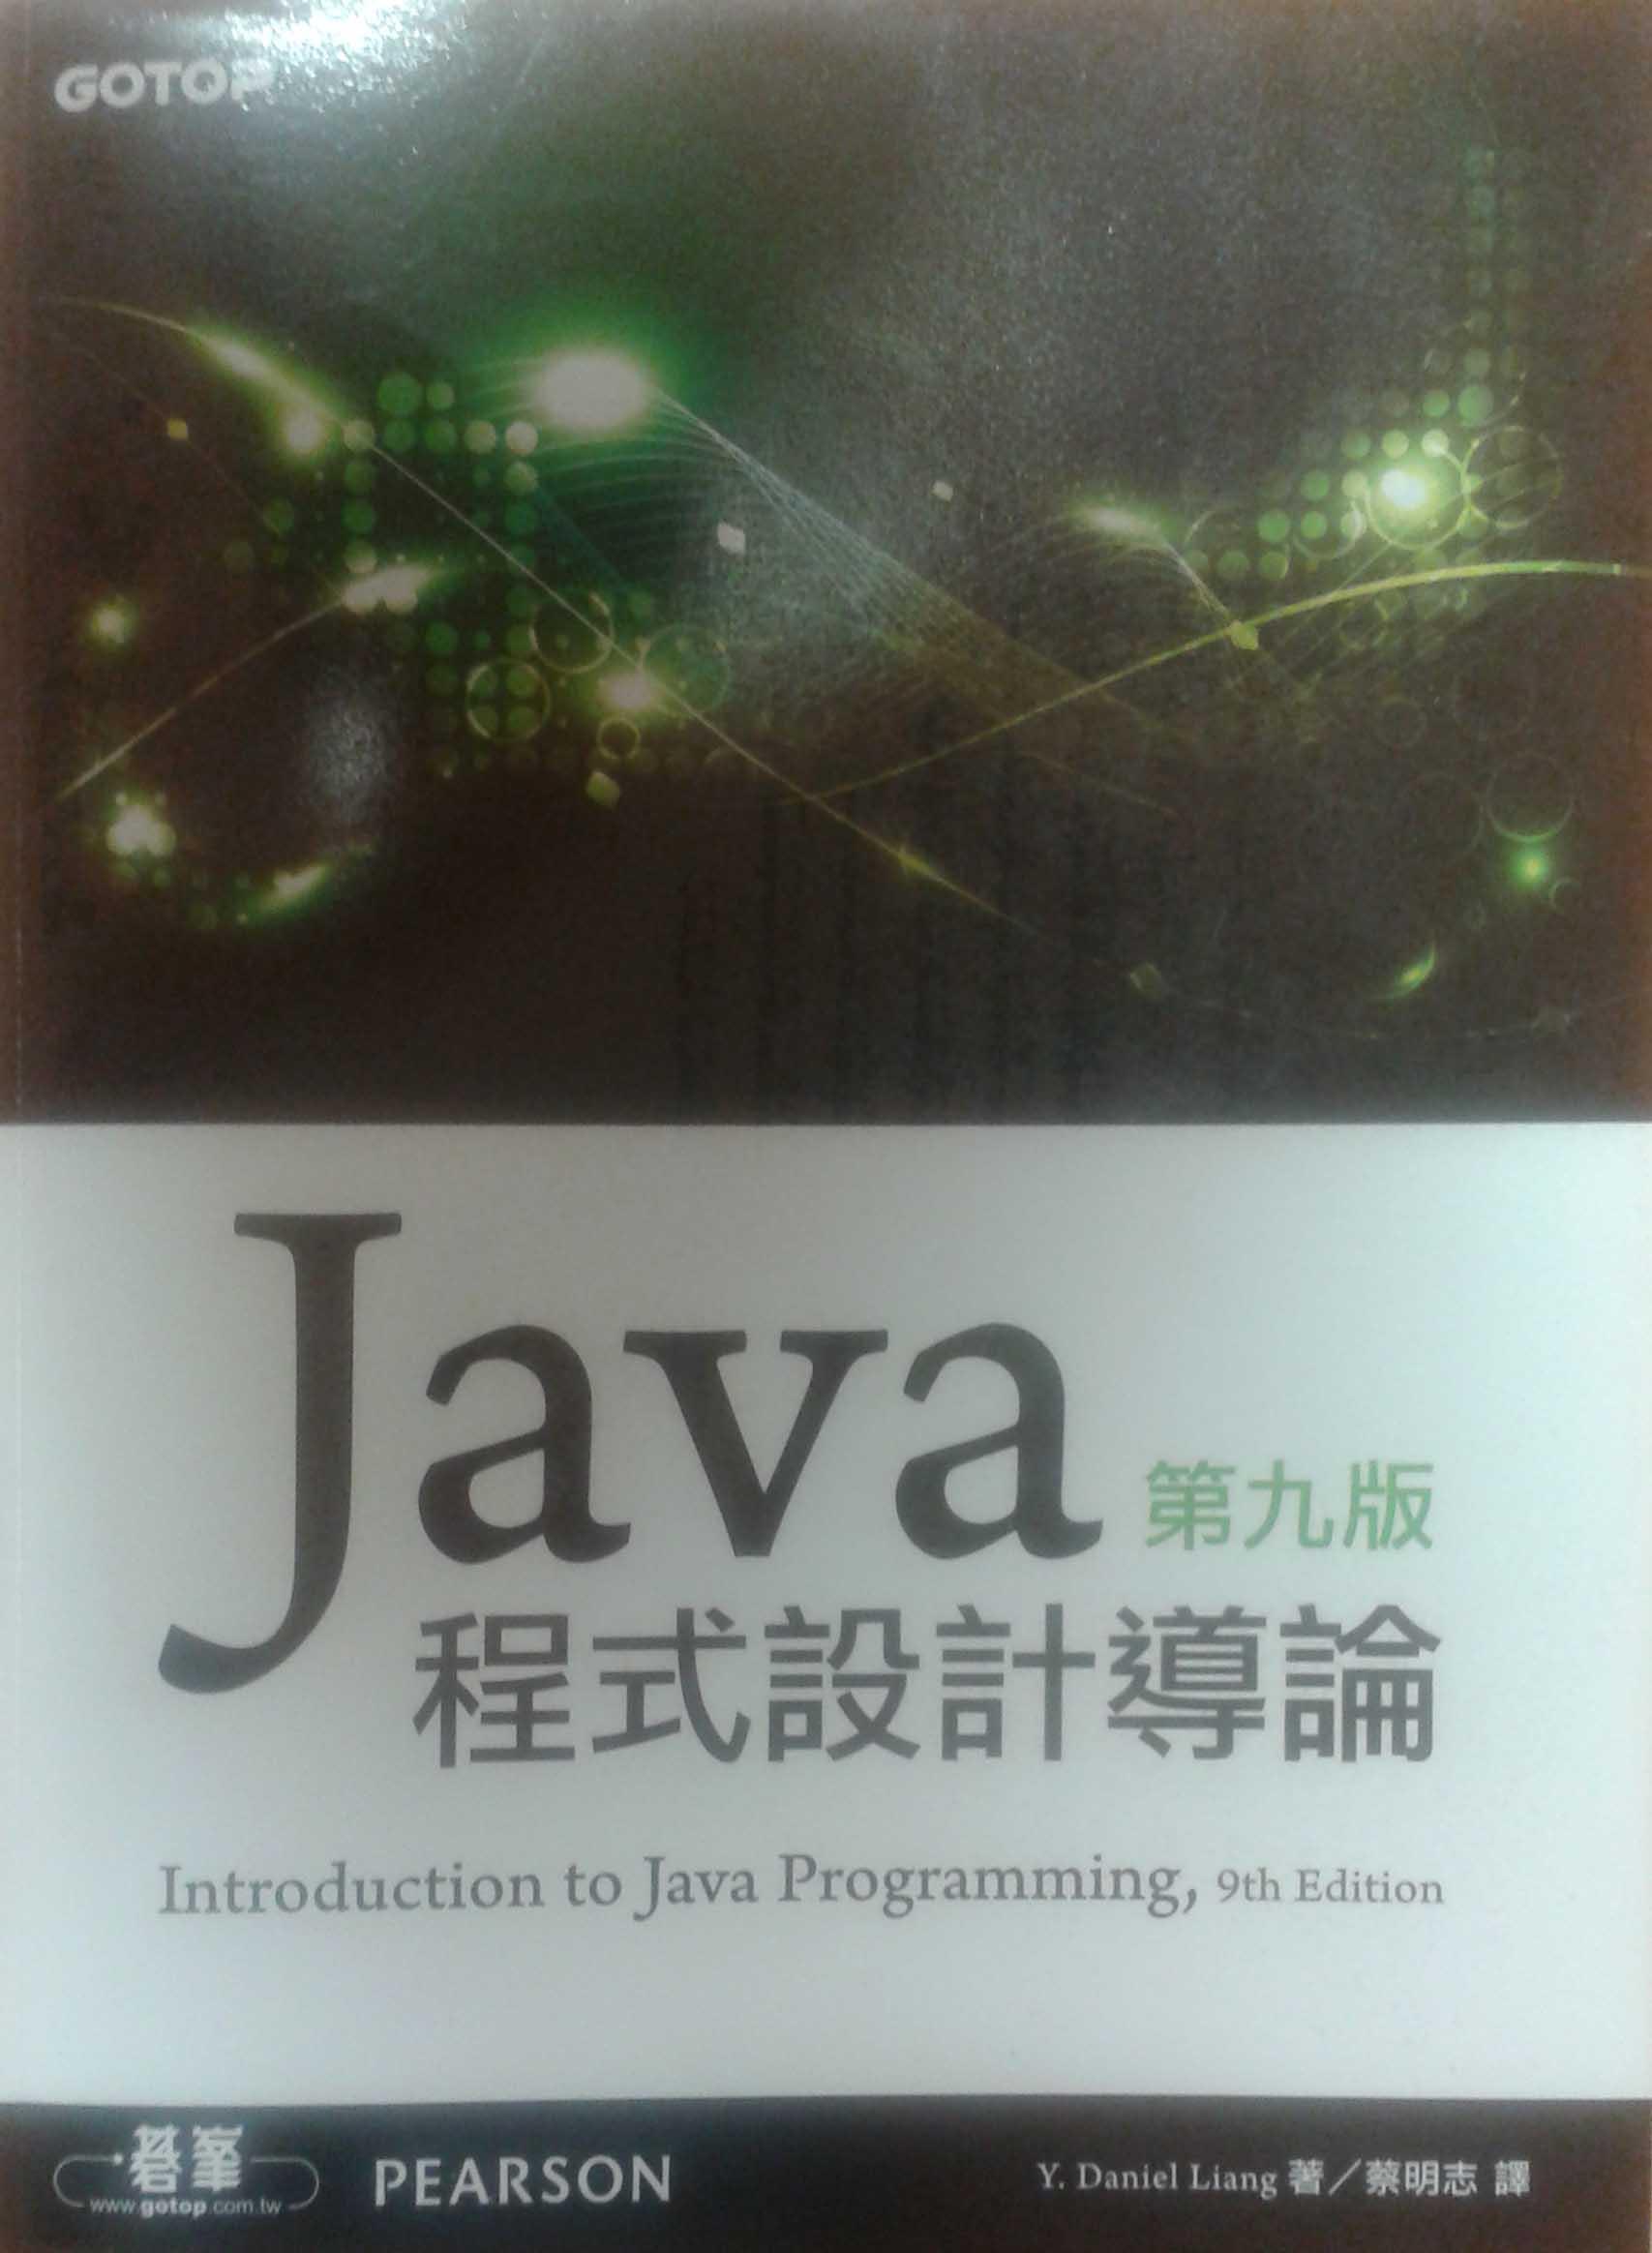 Java 程式設計導論 (第九版)